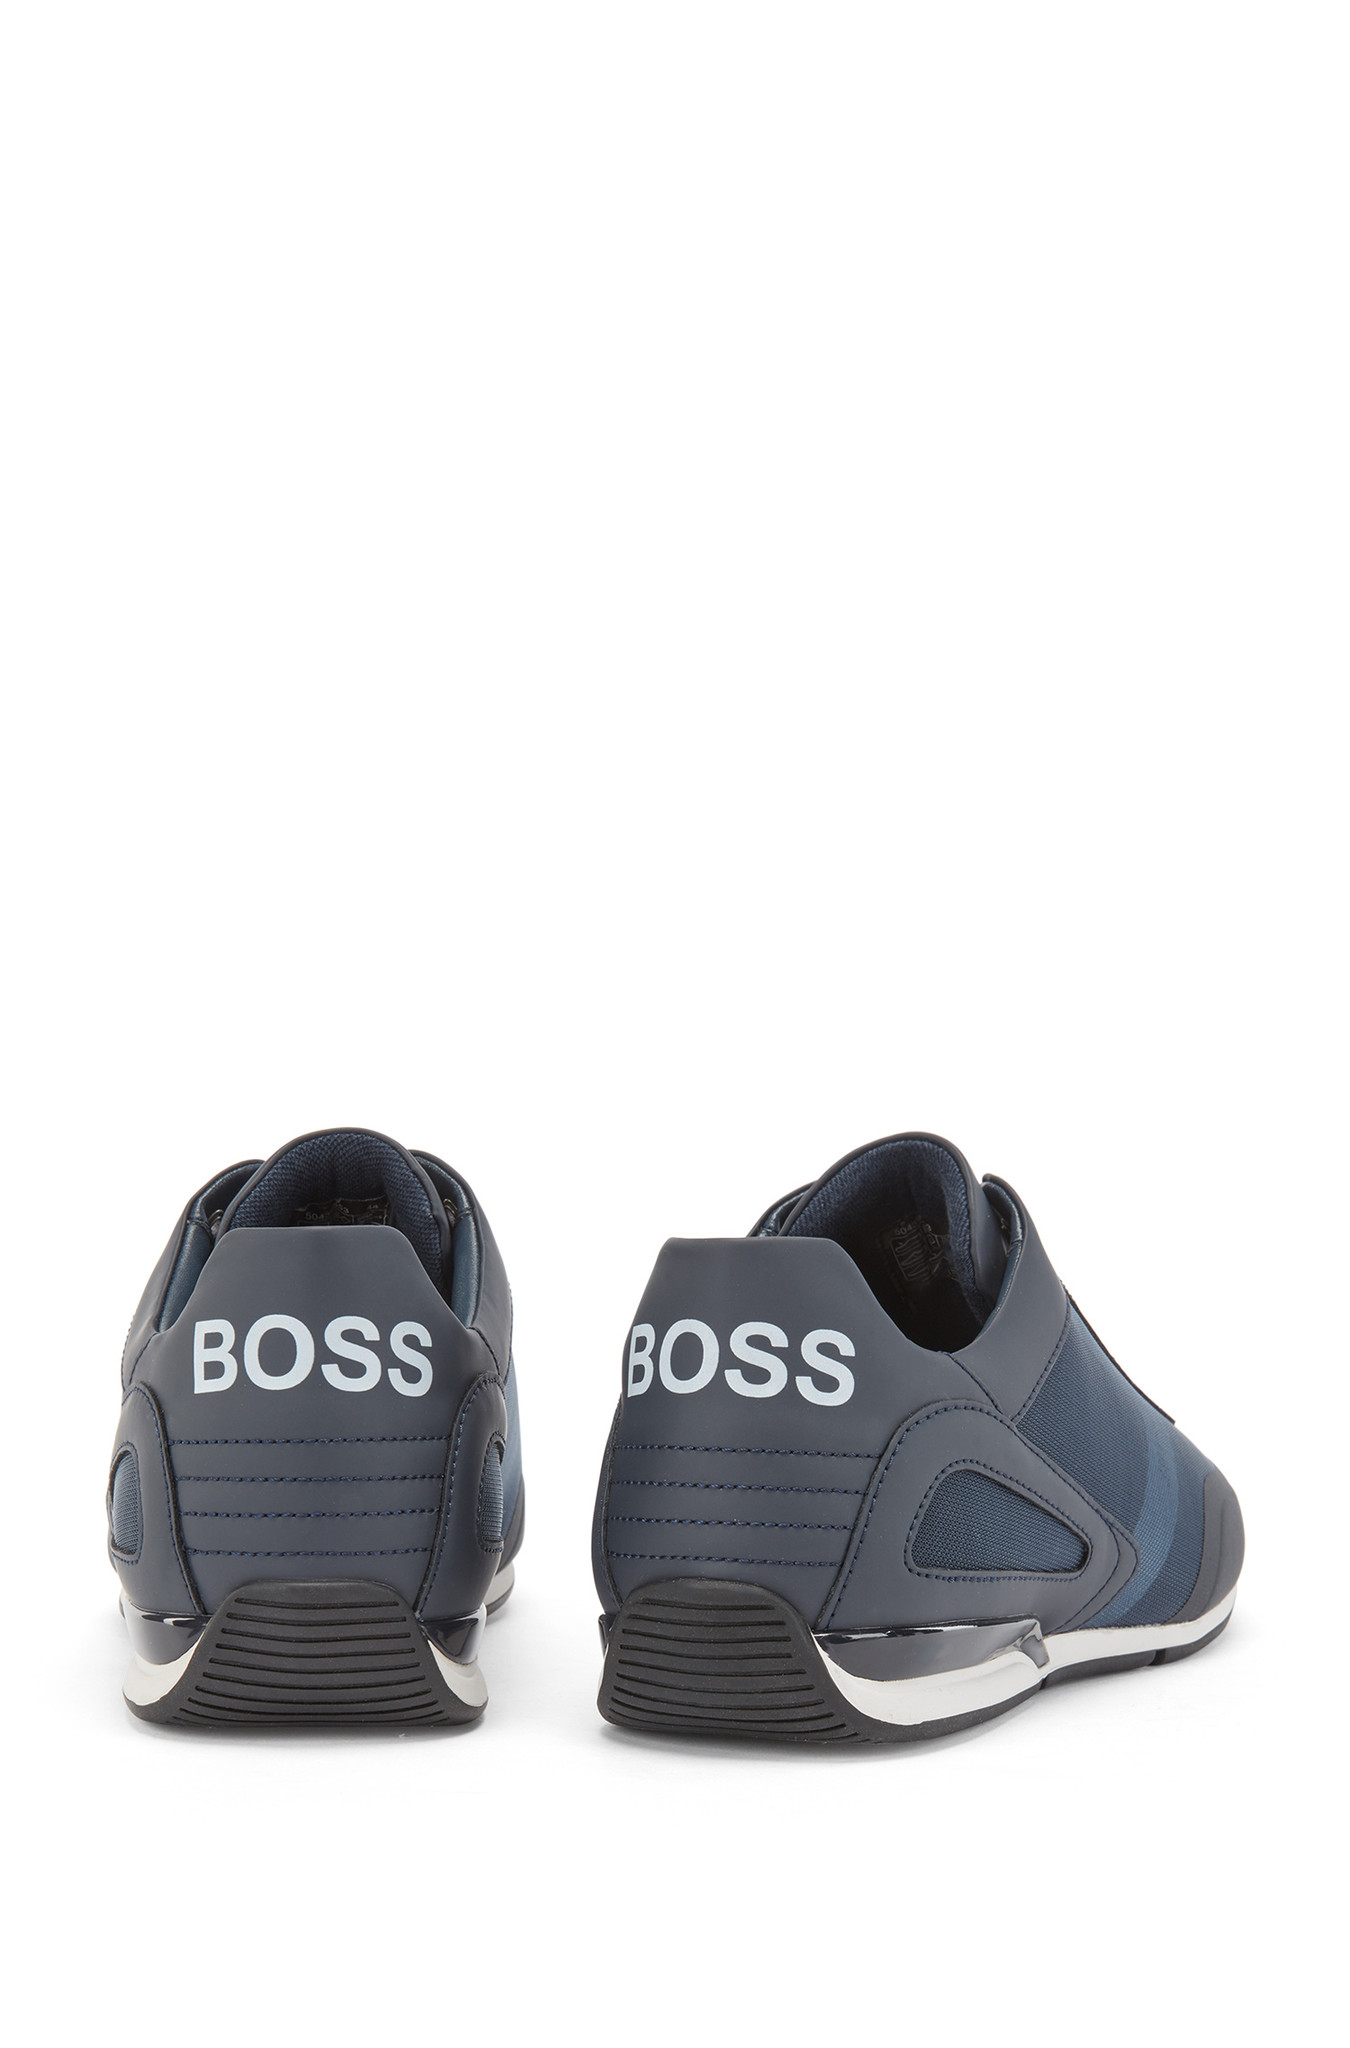 Hugo Boss Schoenen Hugo Boss 50439553-401